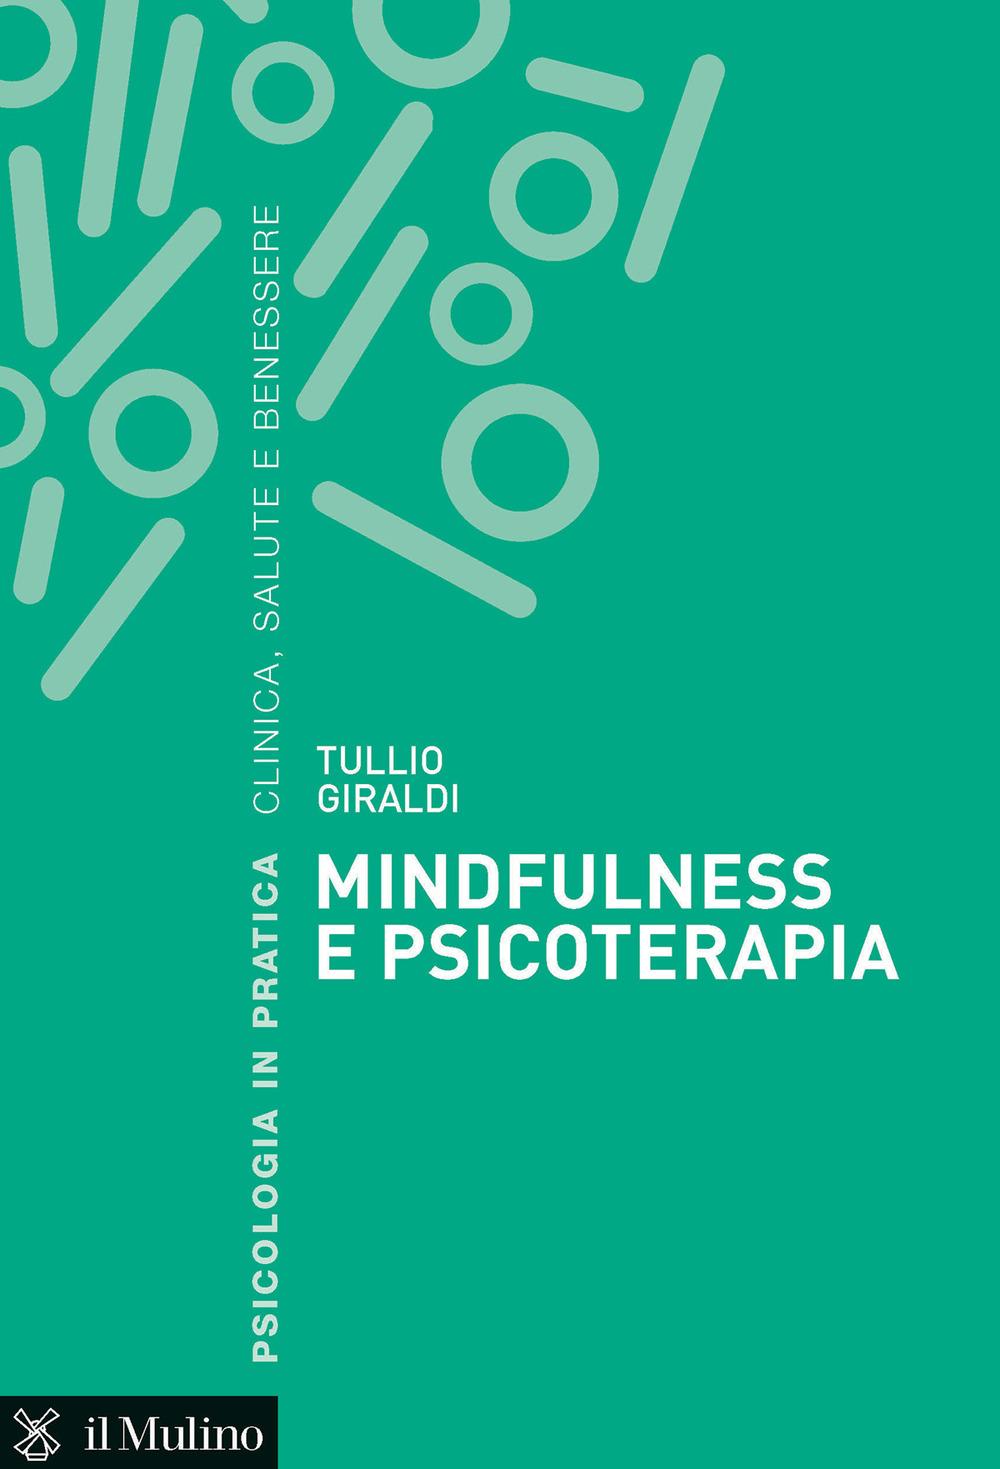 MINDFULNESS E PSICOTERAPIA - Giraldi Tullio - 9788815290717